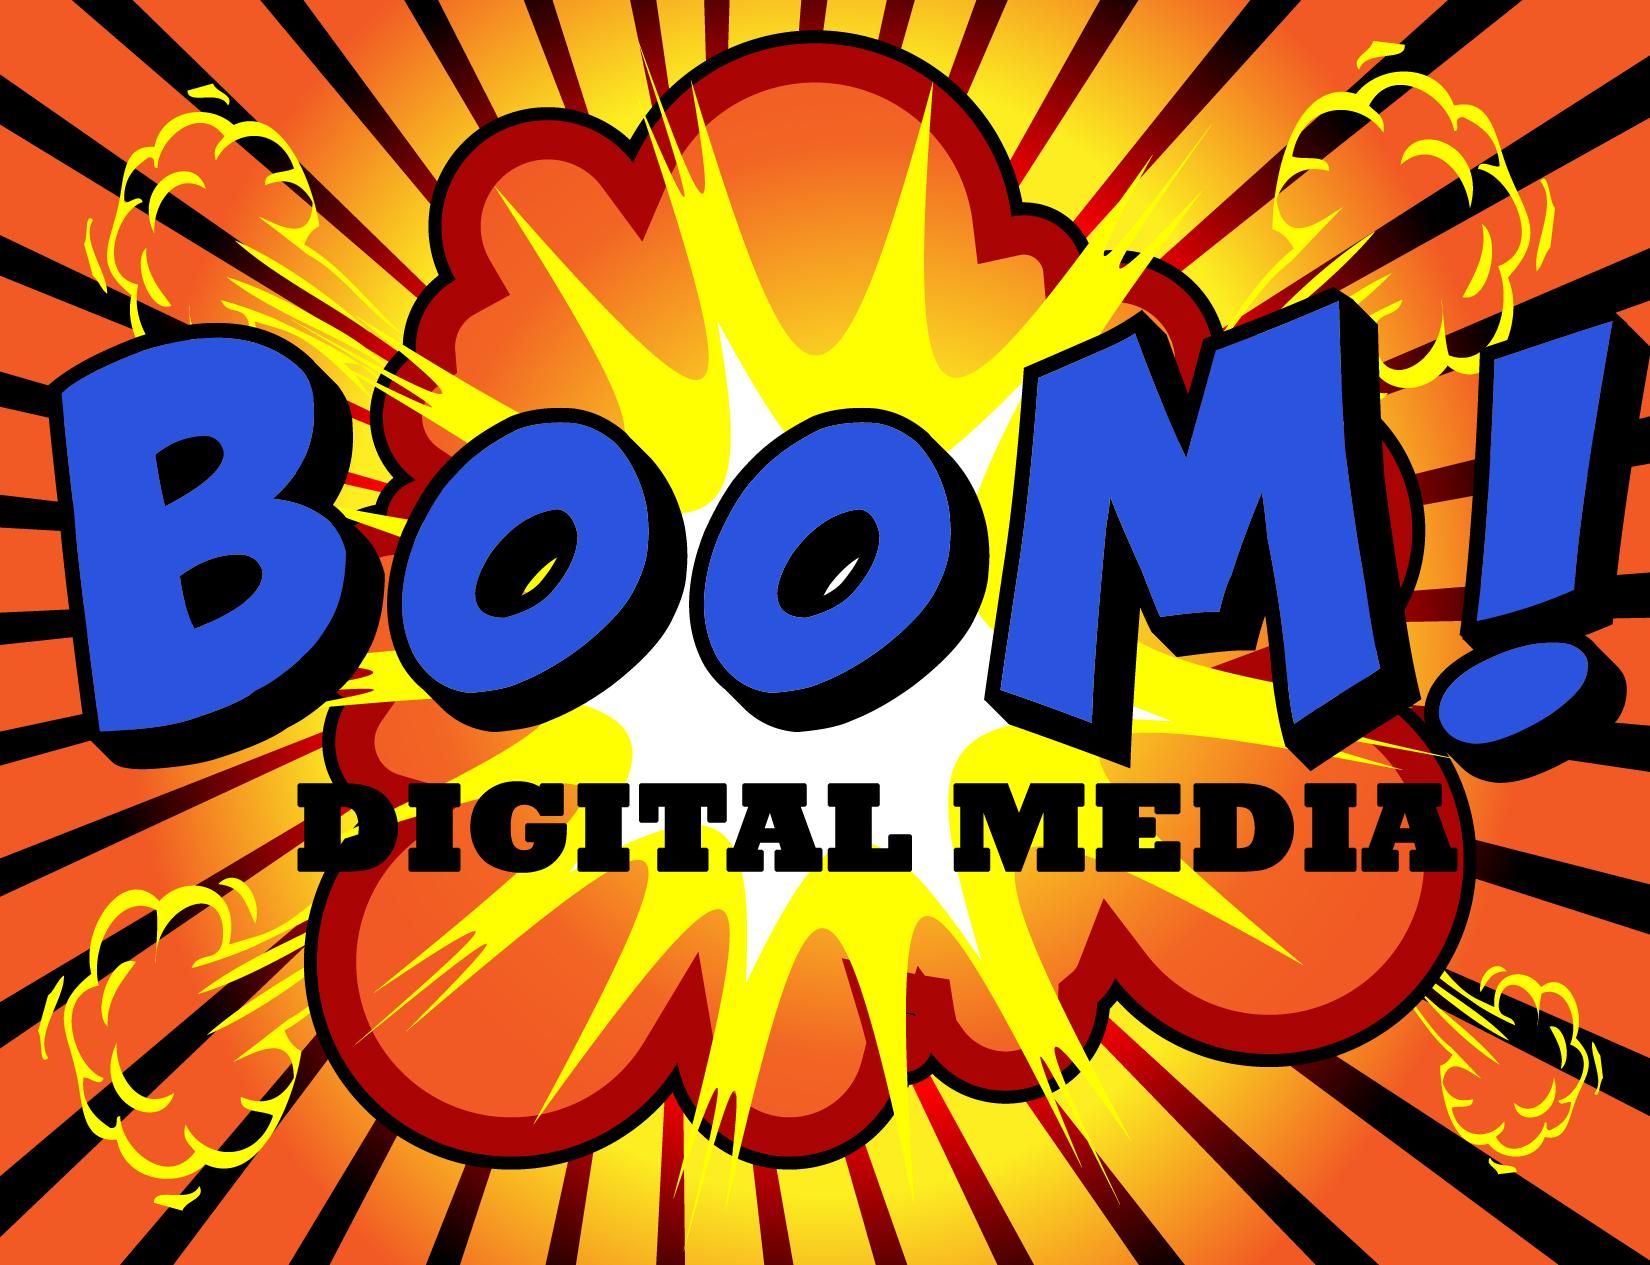 Boom Digital Media